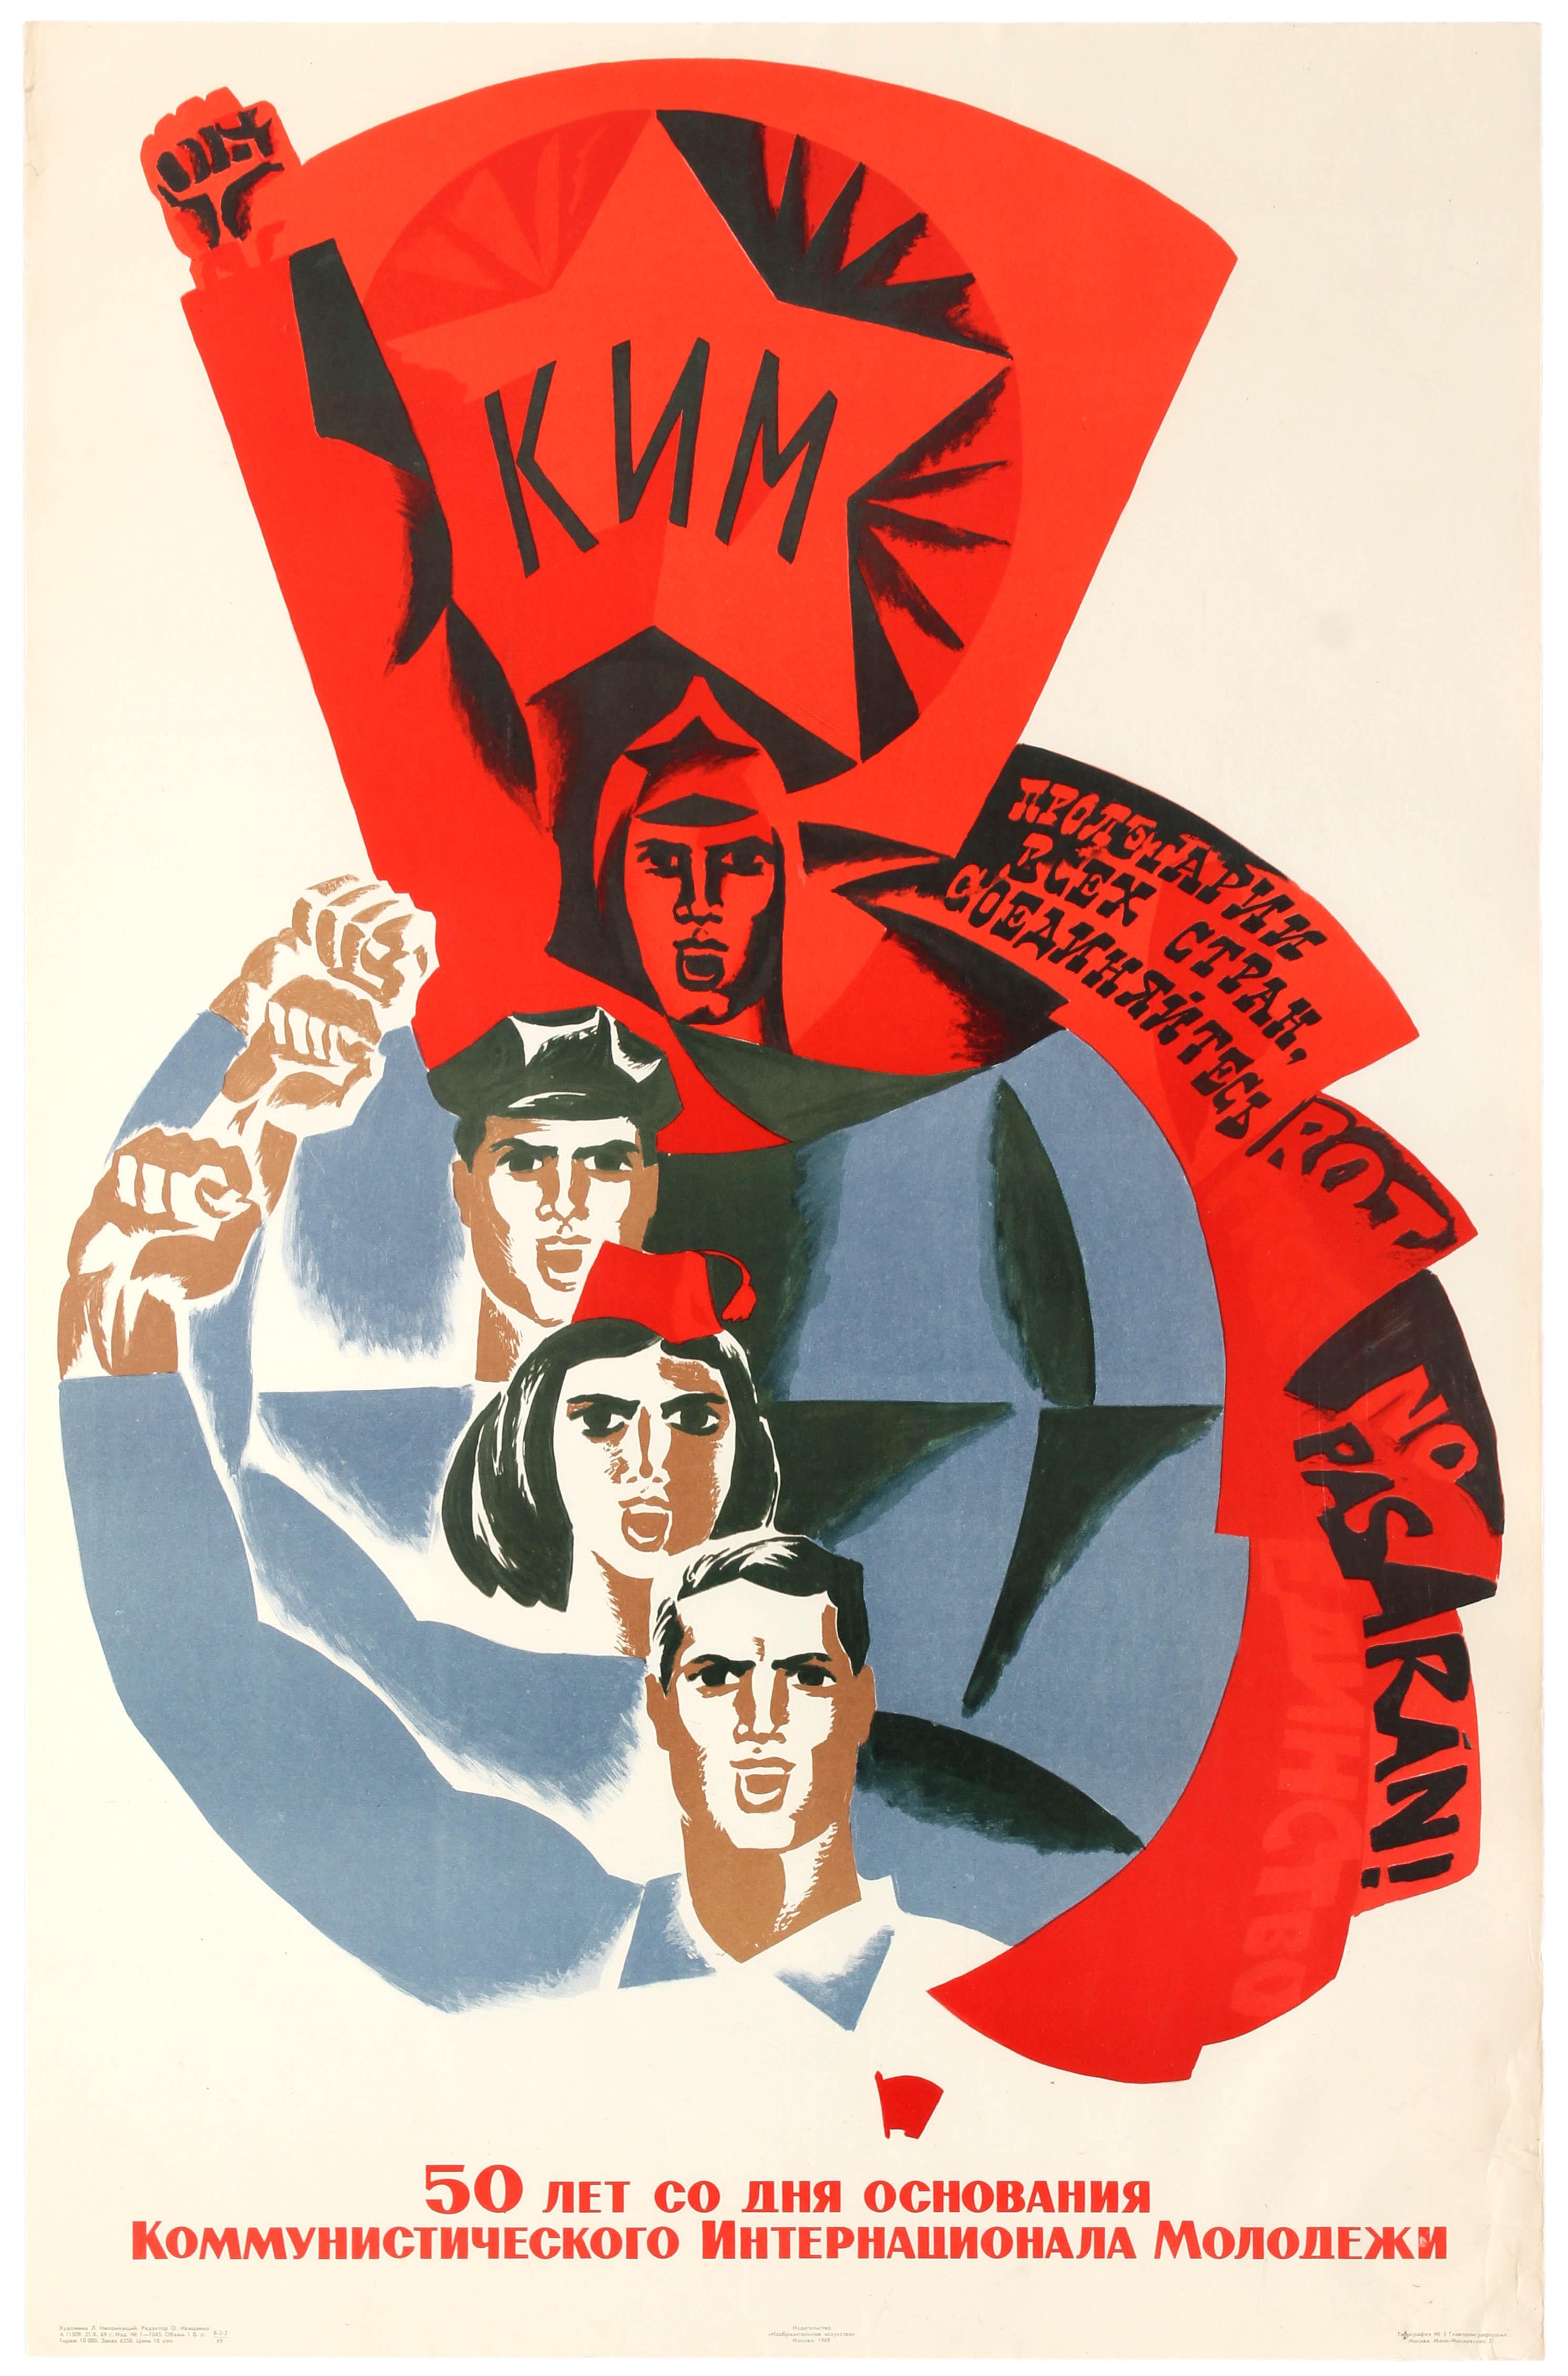 Lot 59 - Set 3 Propaganda Posters Constructivism USSR Lenin Marxism Soviet Youth